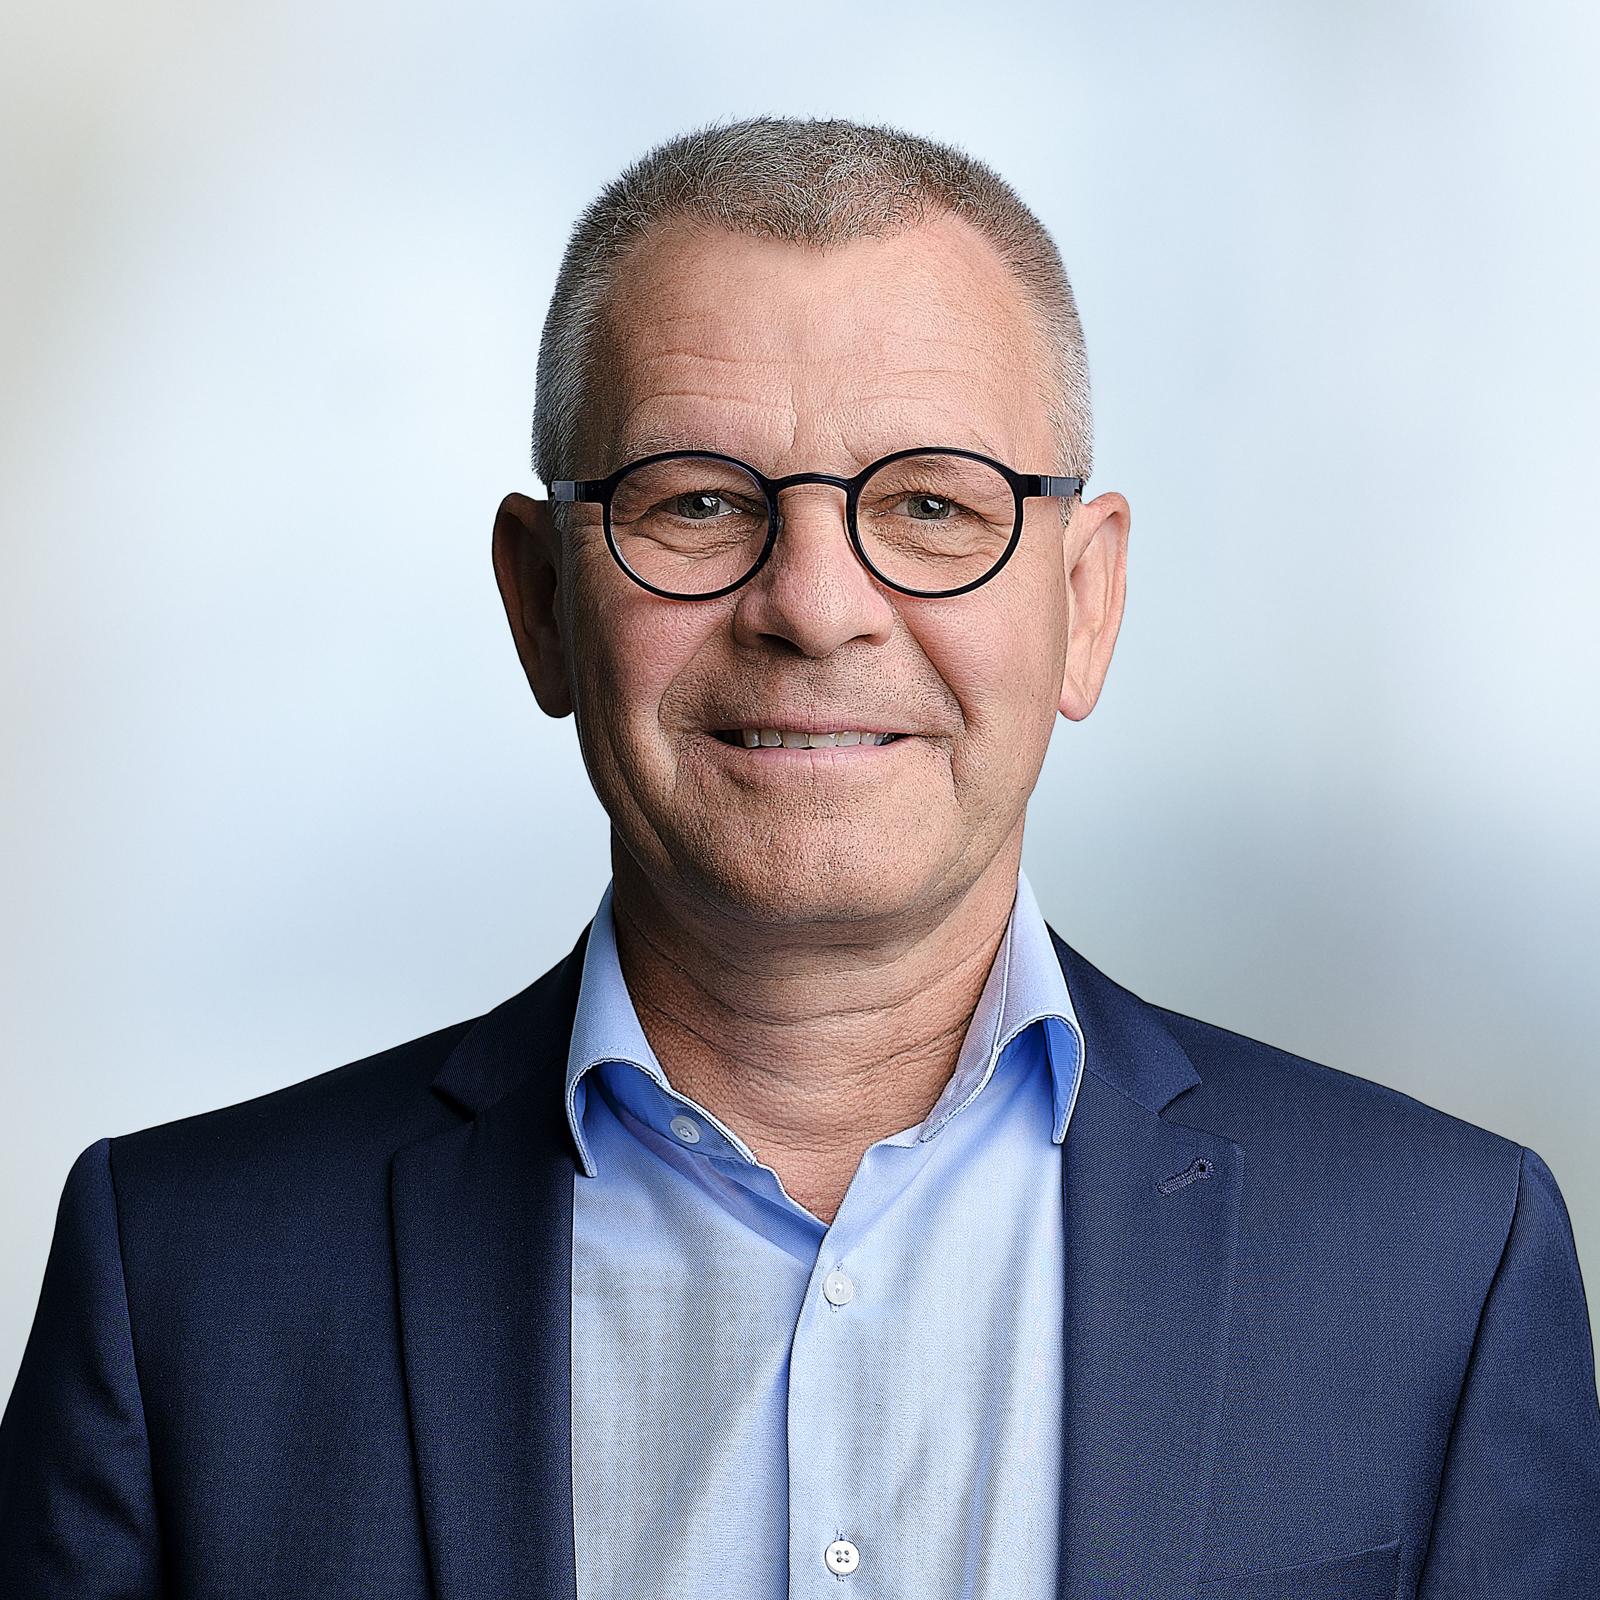 Henrik Troelsen